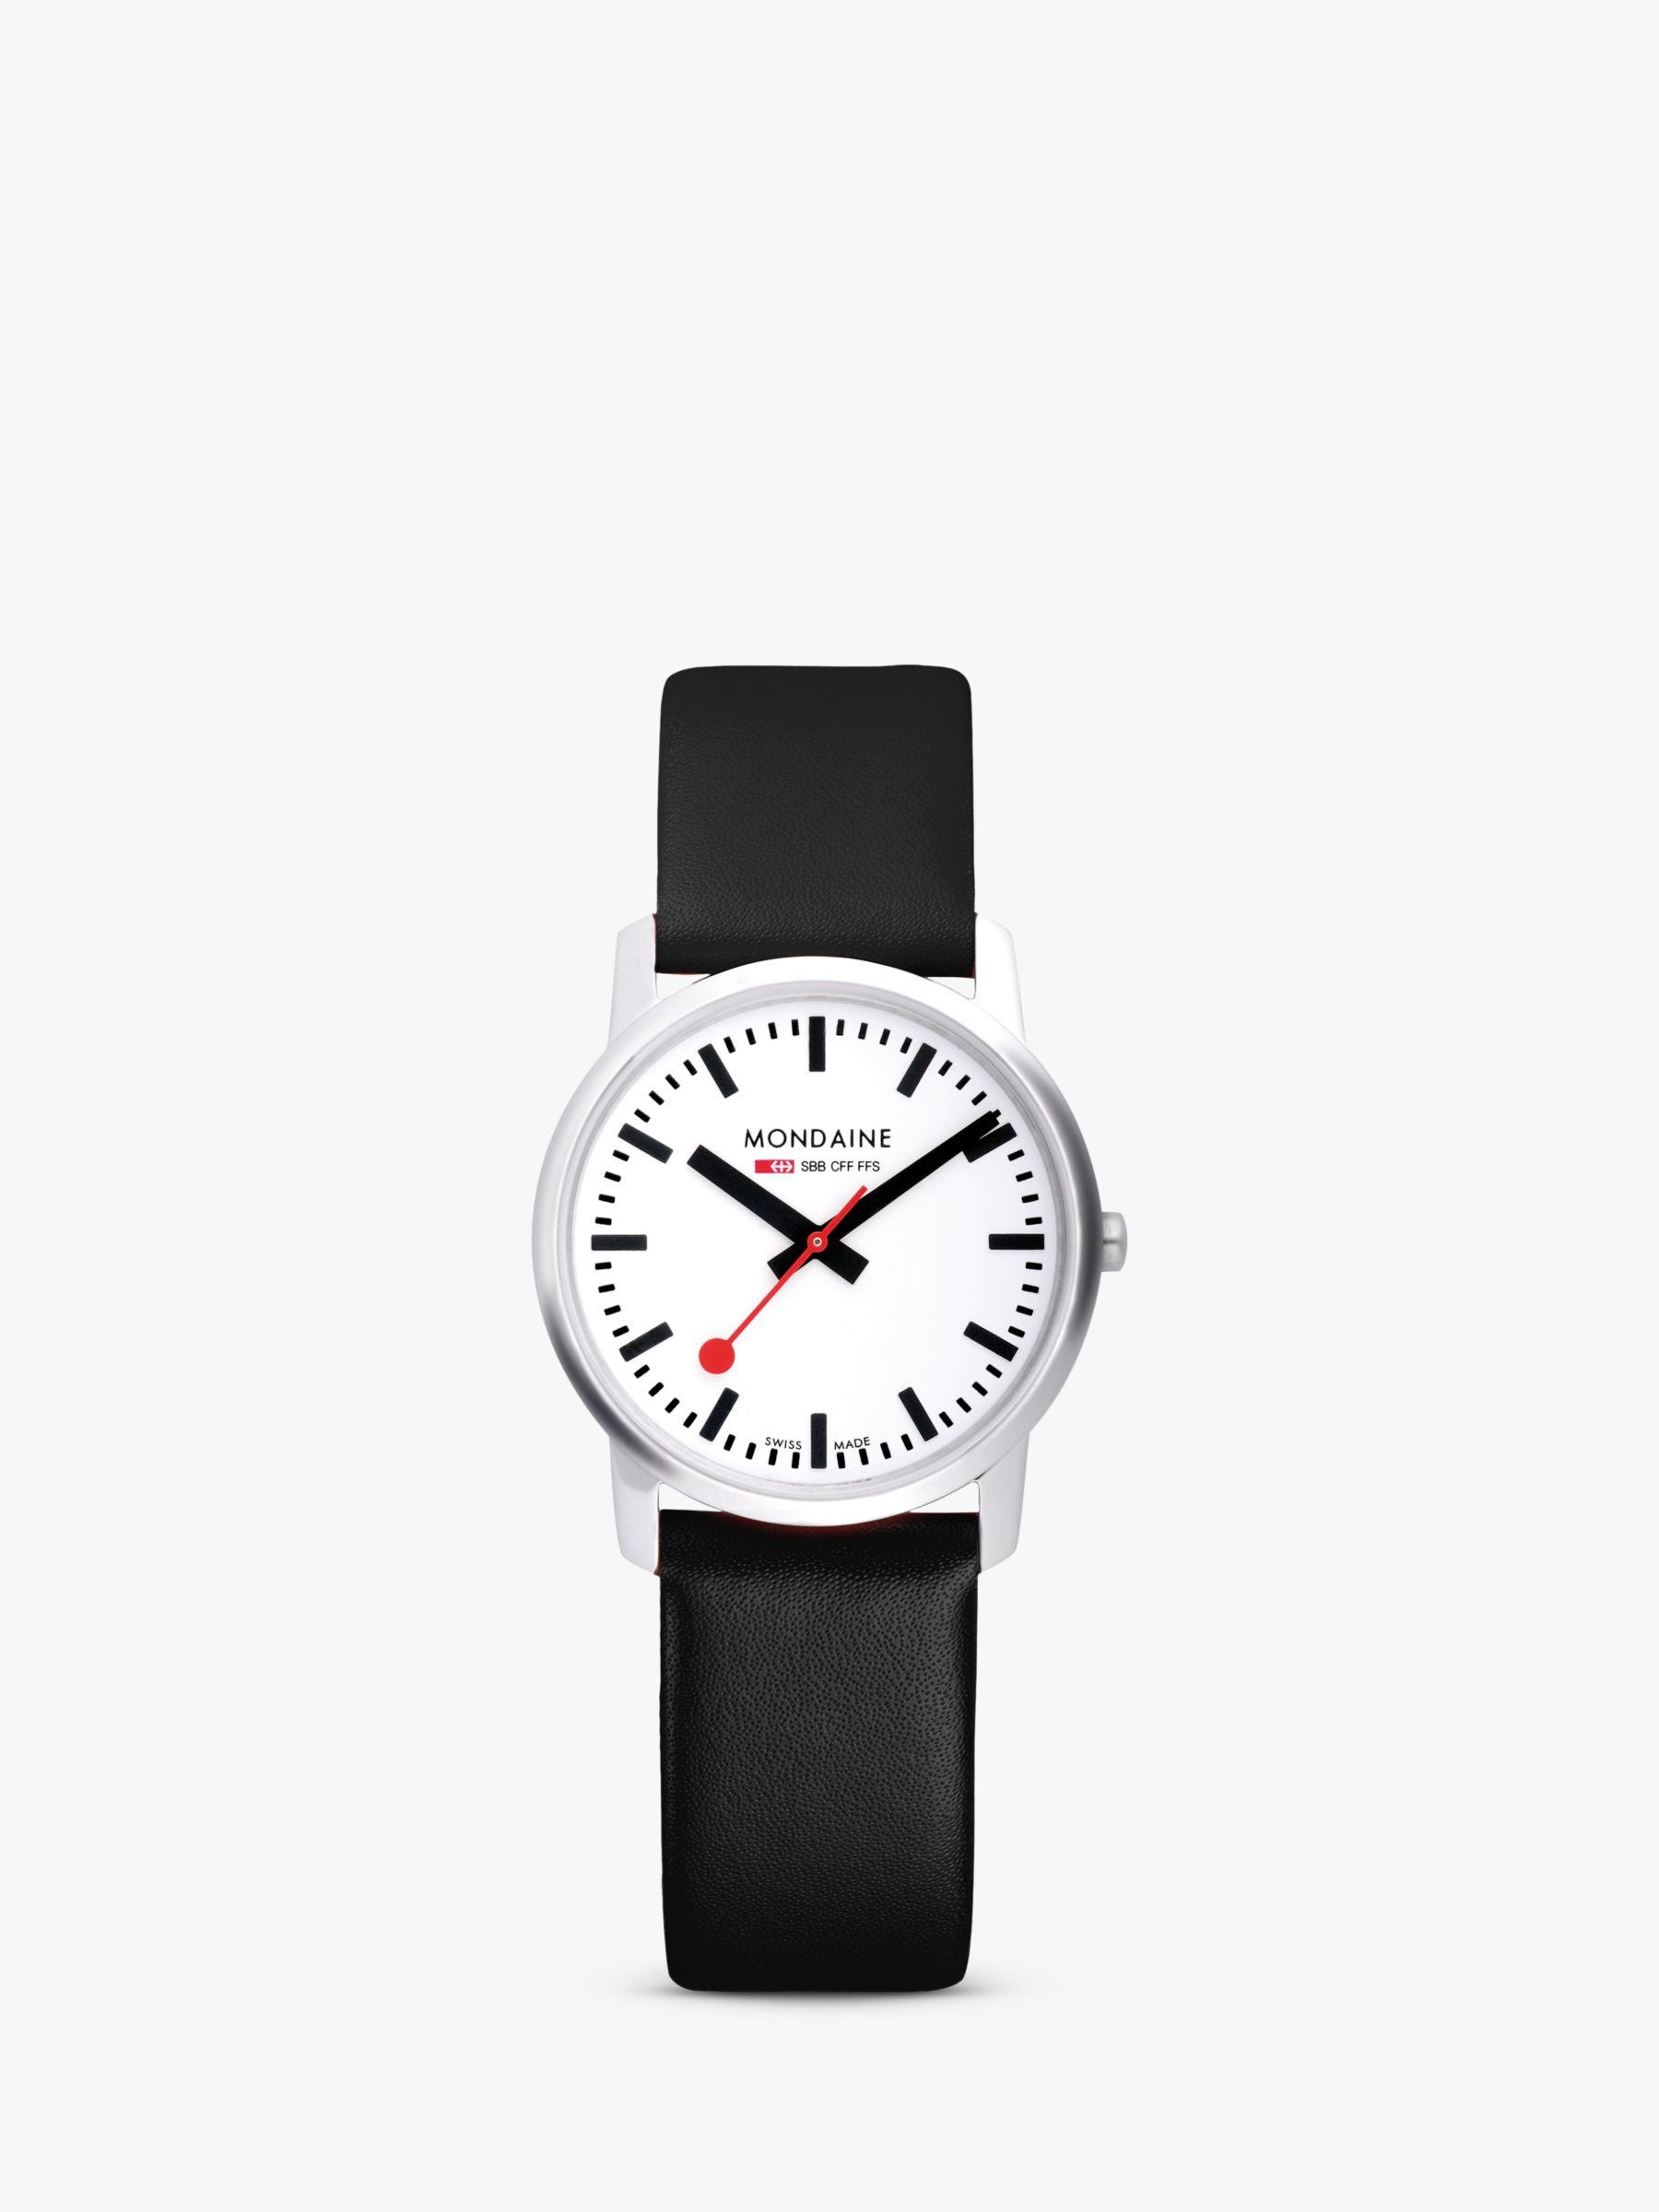 Mondaine Mondaine Unisex Simply Elegant Leather Strap Watch